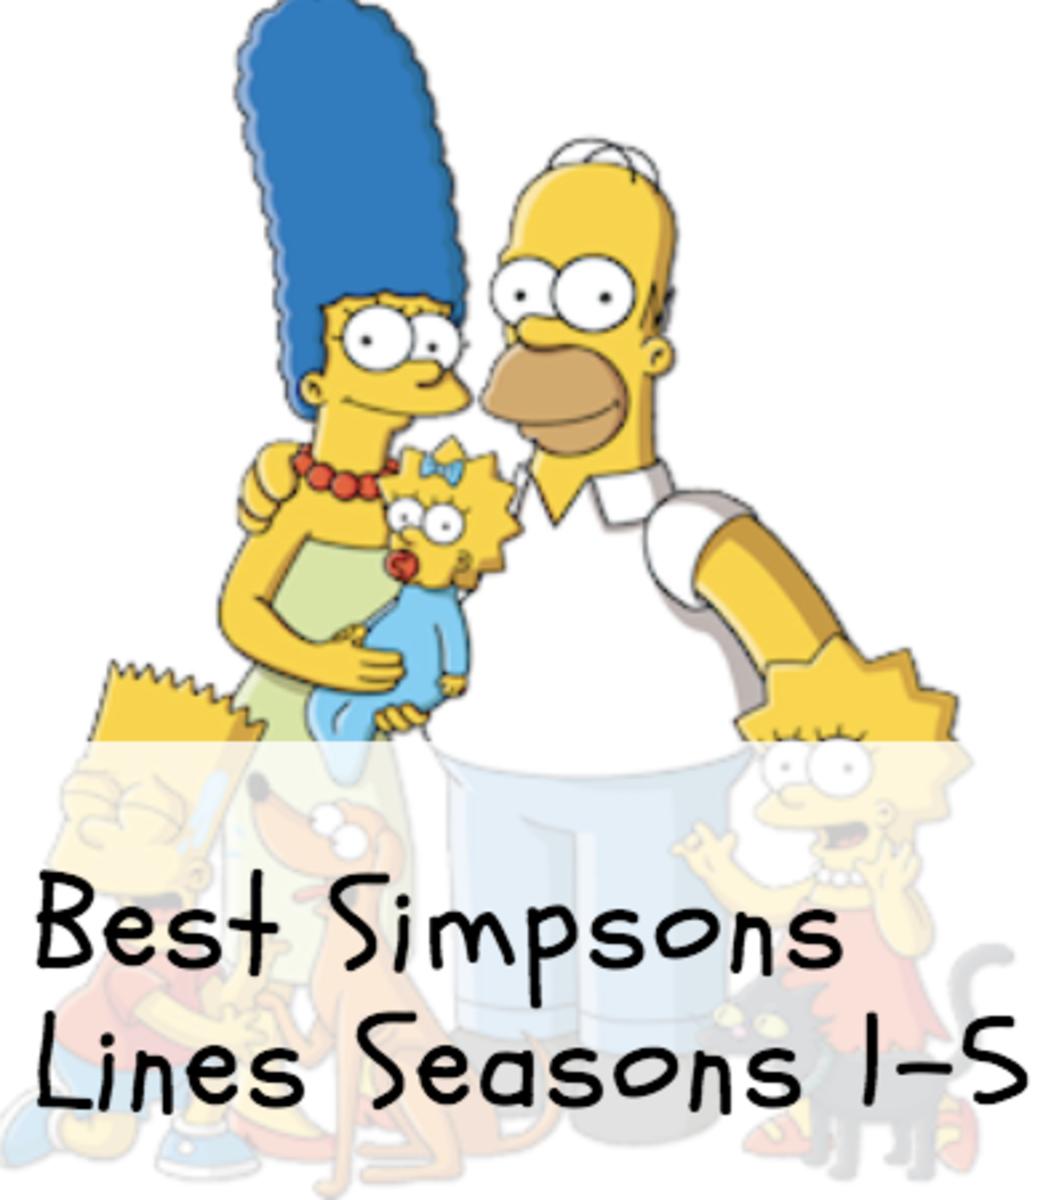 Best Simpsons Quotes Seasons 1-5